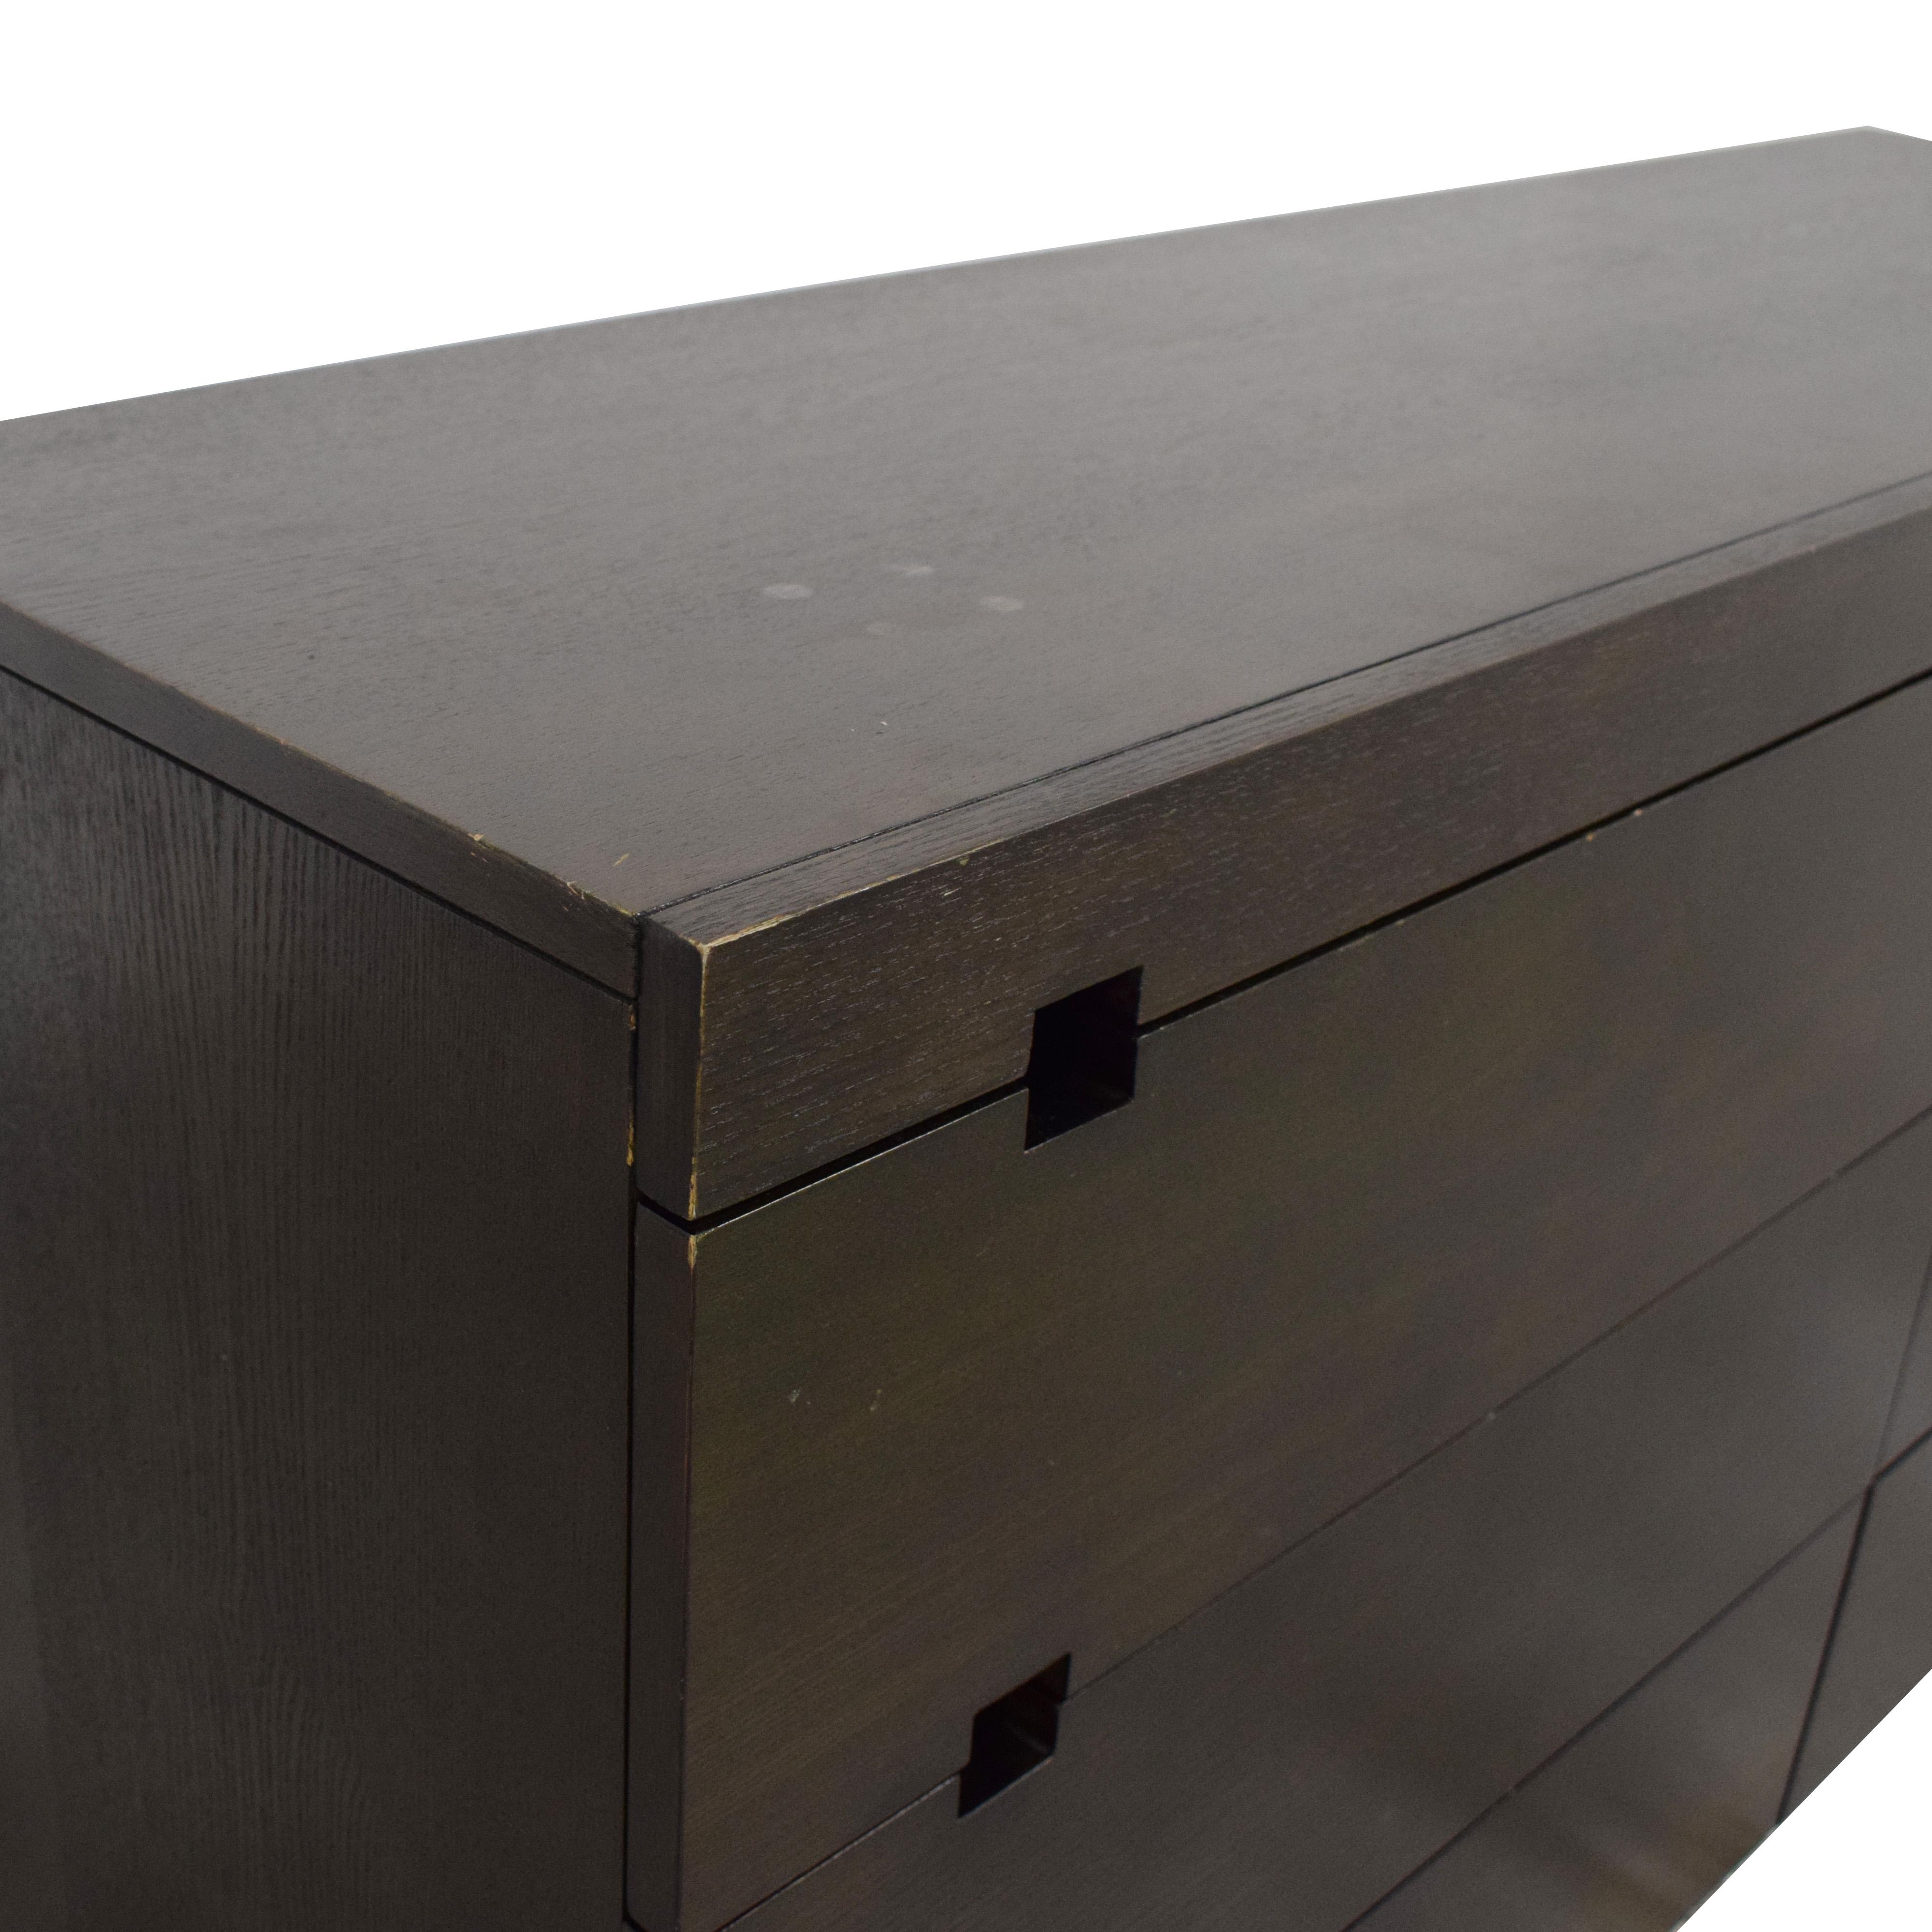 West Elm West Elm Square Cutout Dresser used